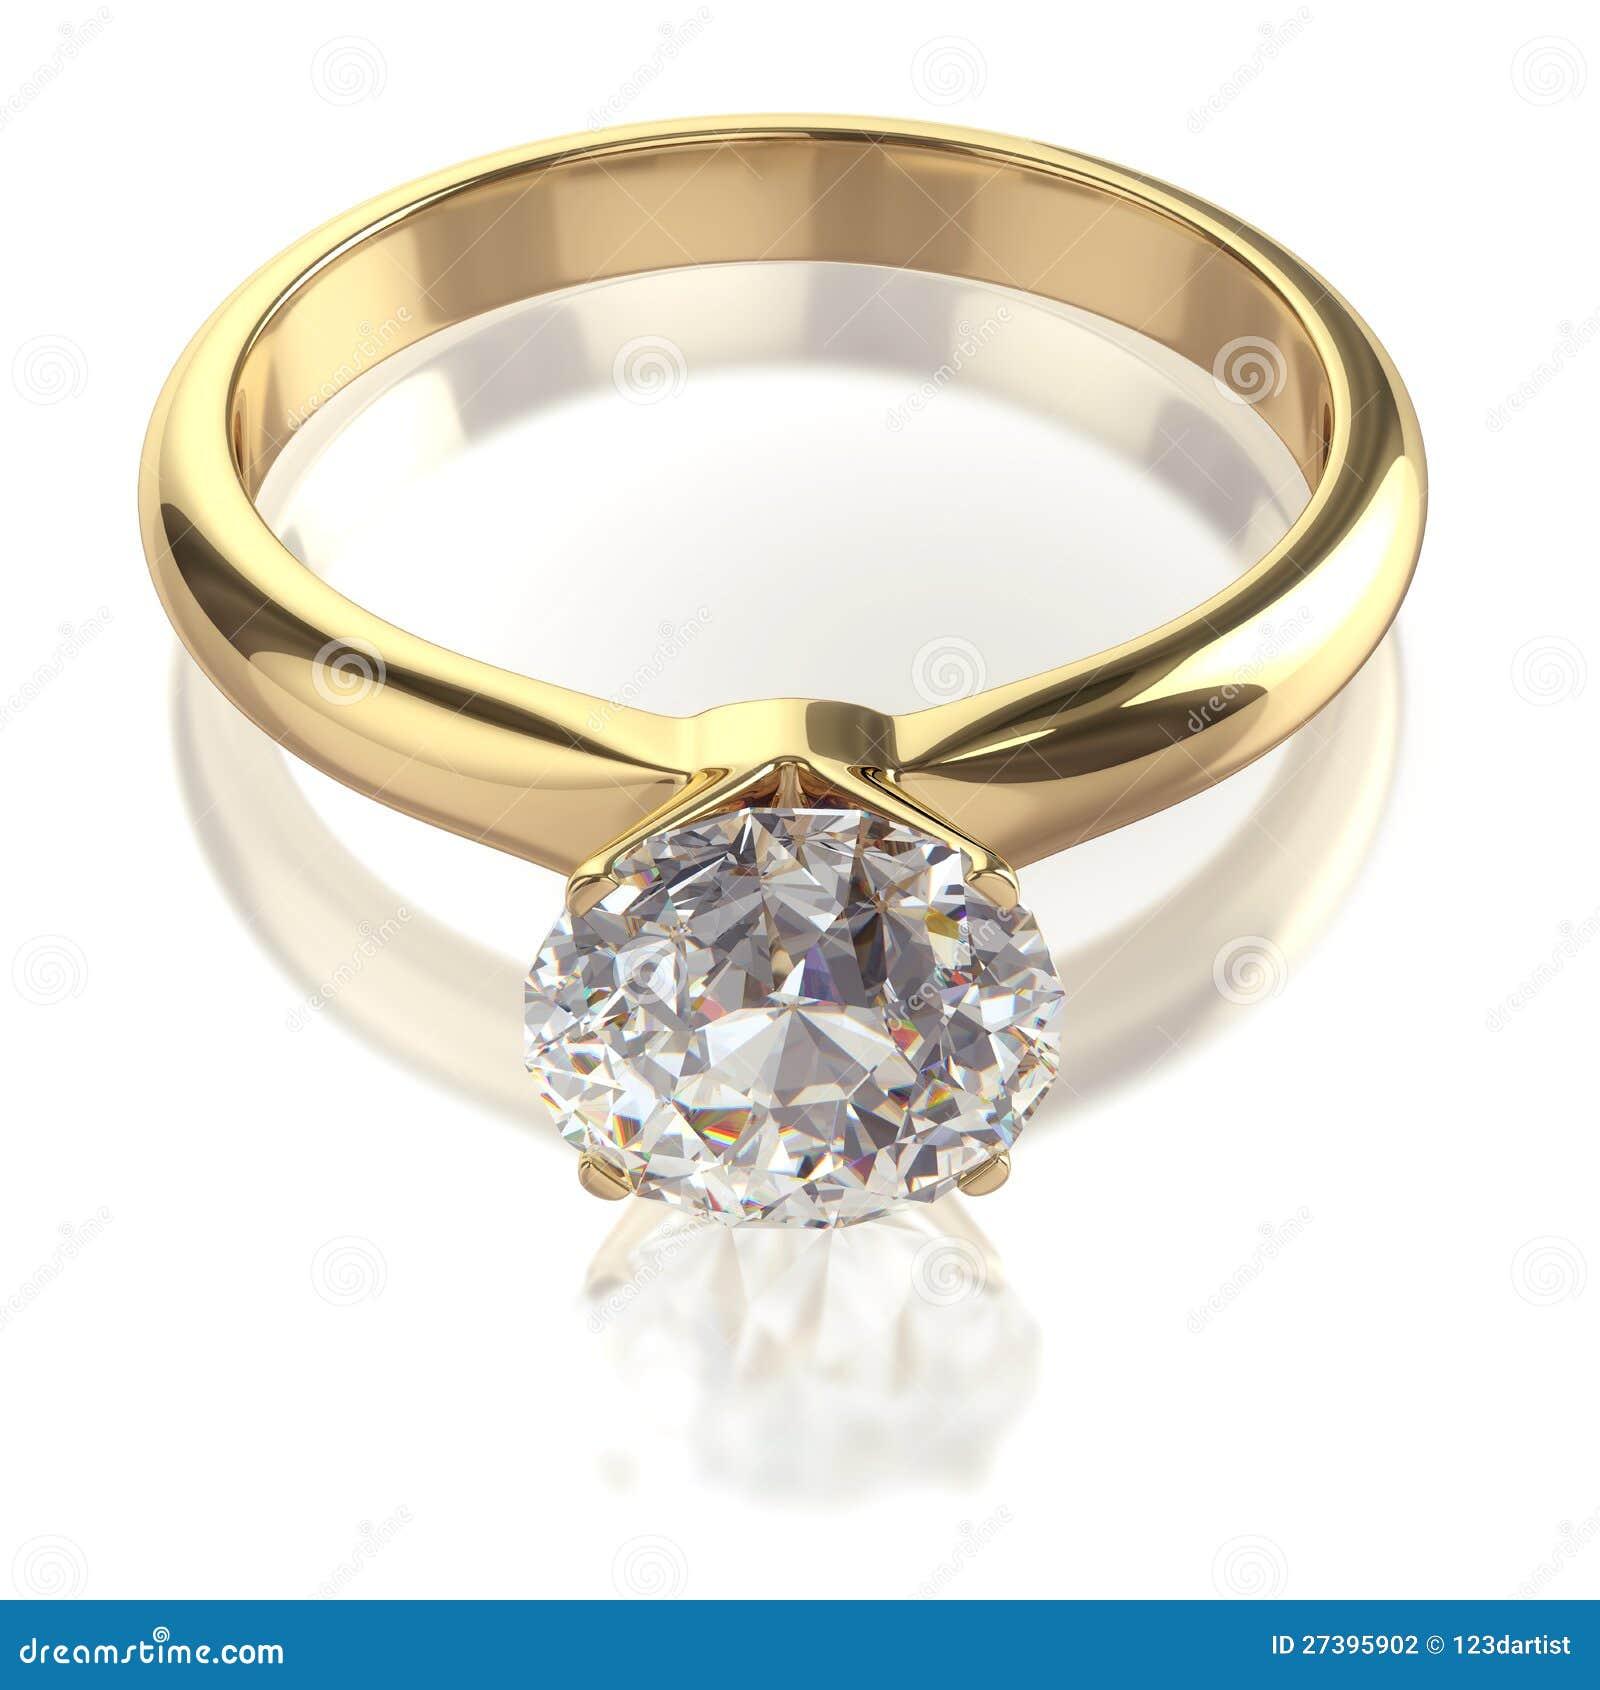 How Big Is   Carat Diamond